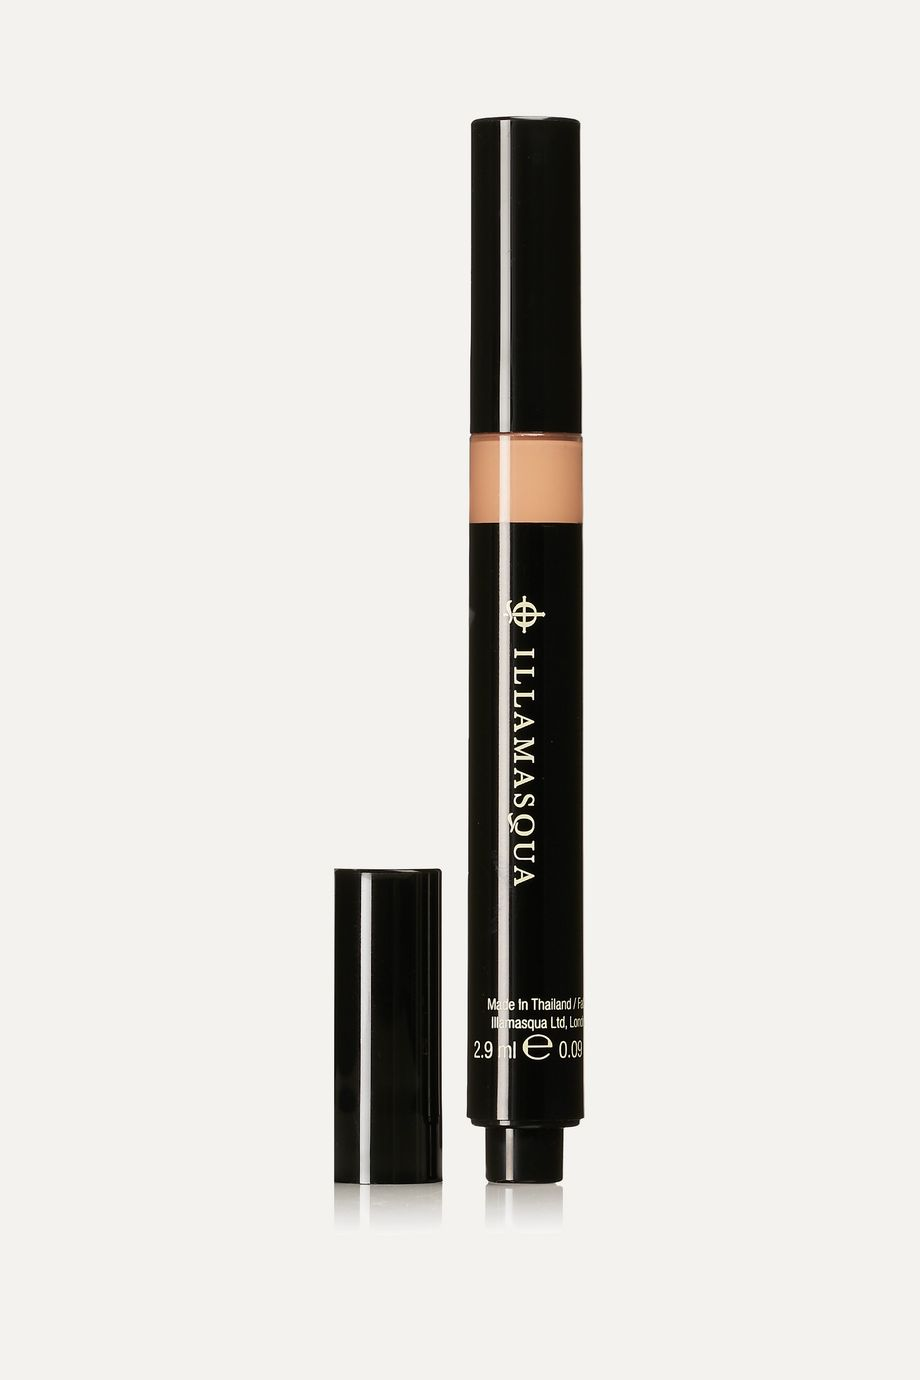 Illamasqua Skin Base Concealer Pen - Medium 2